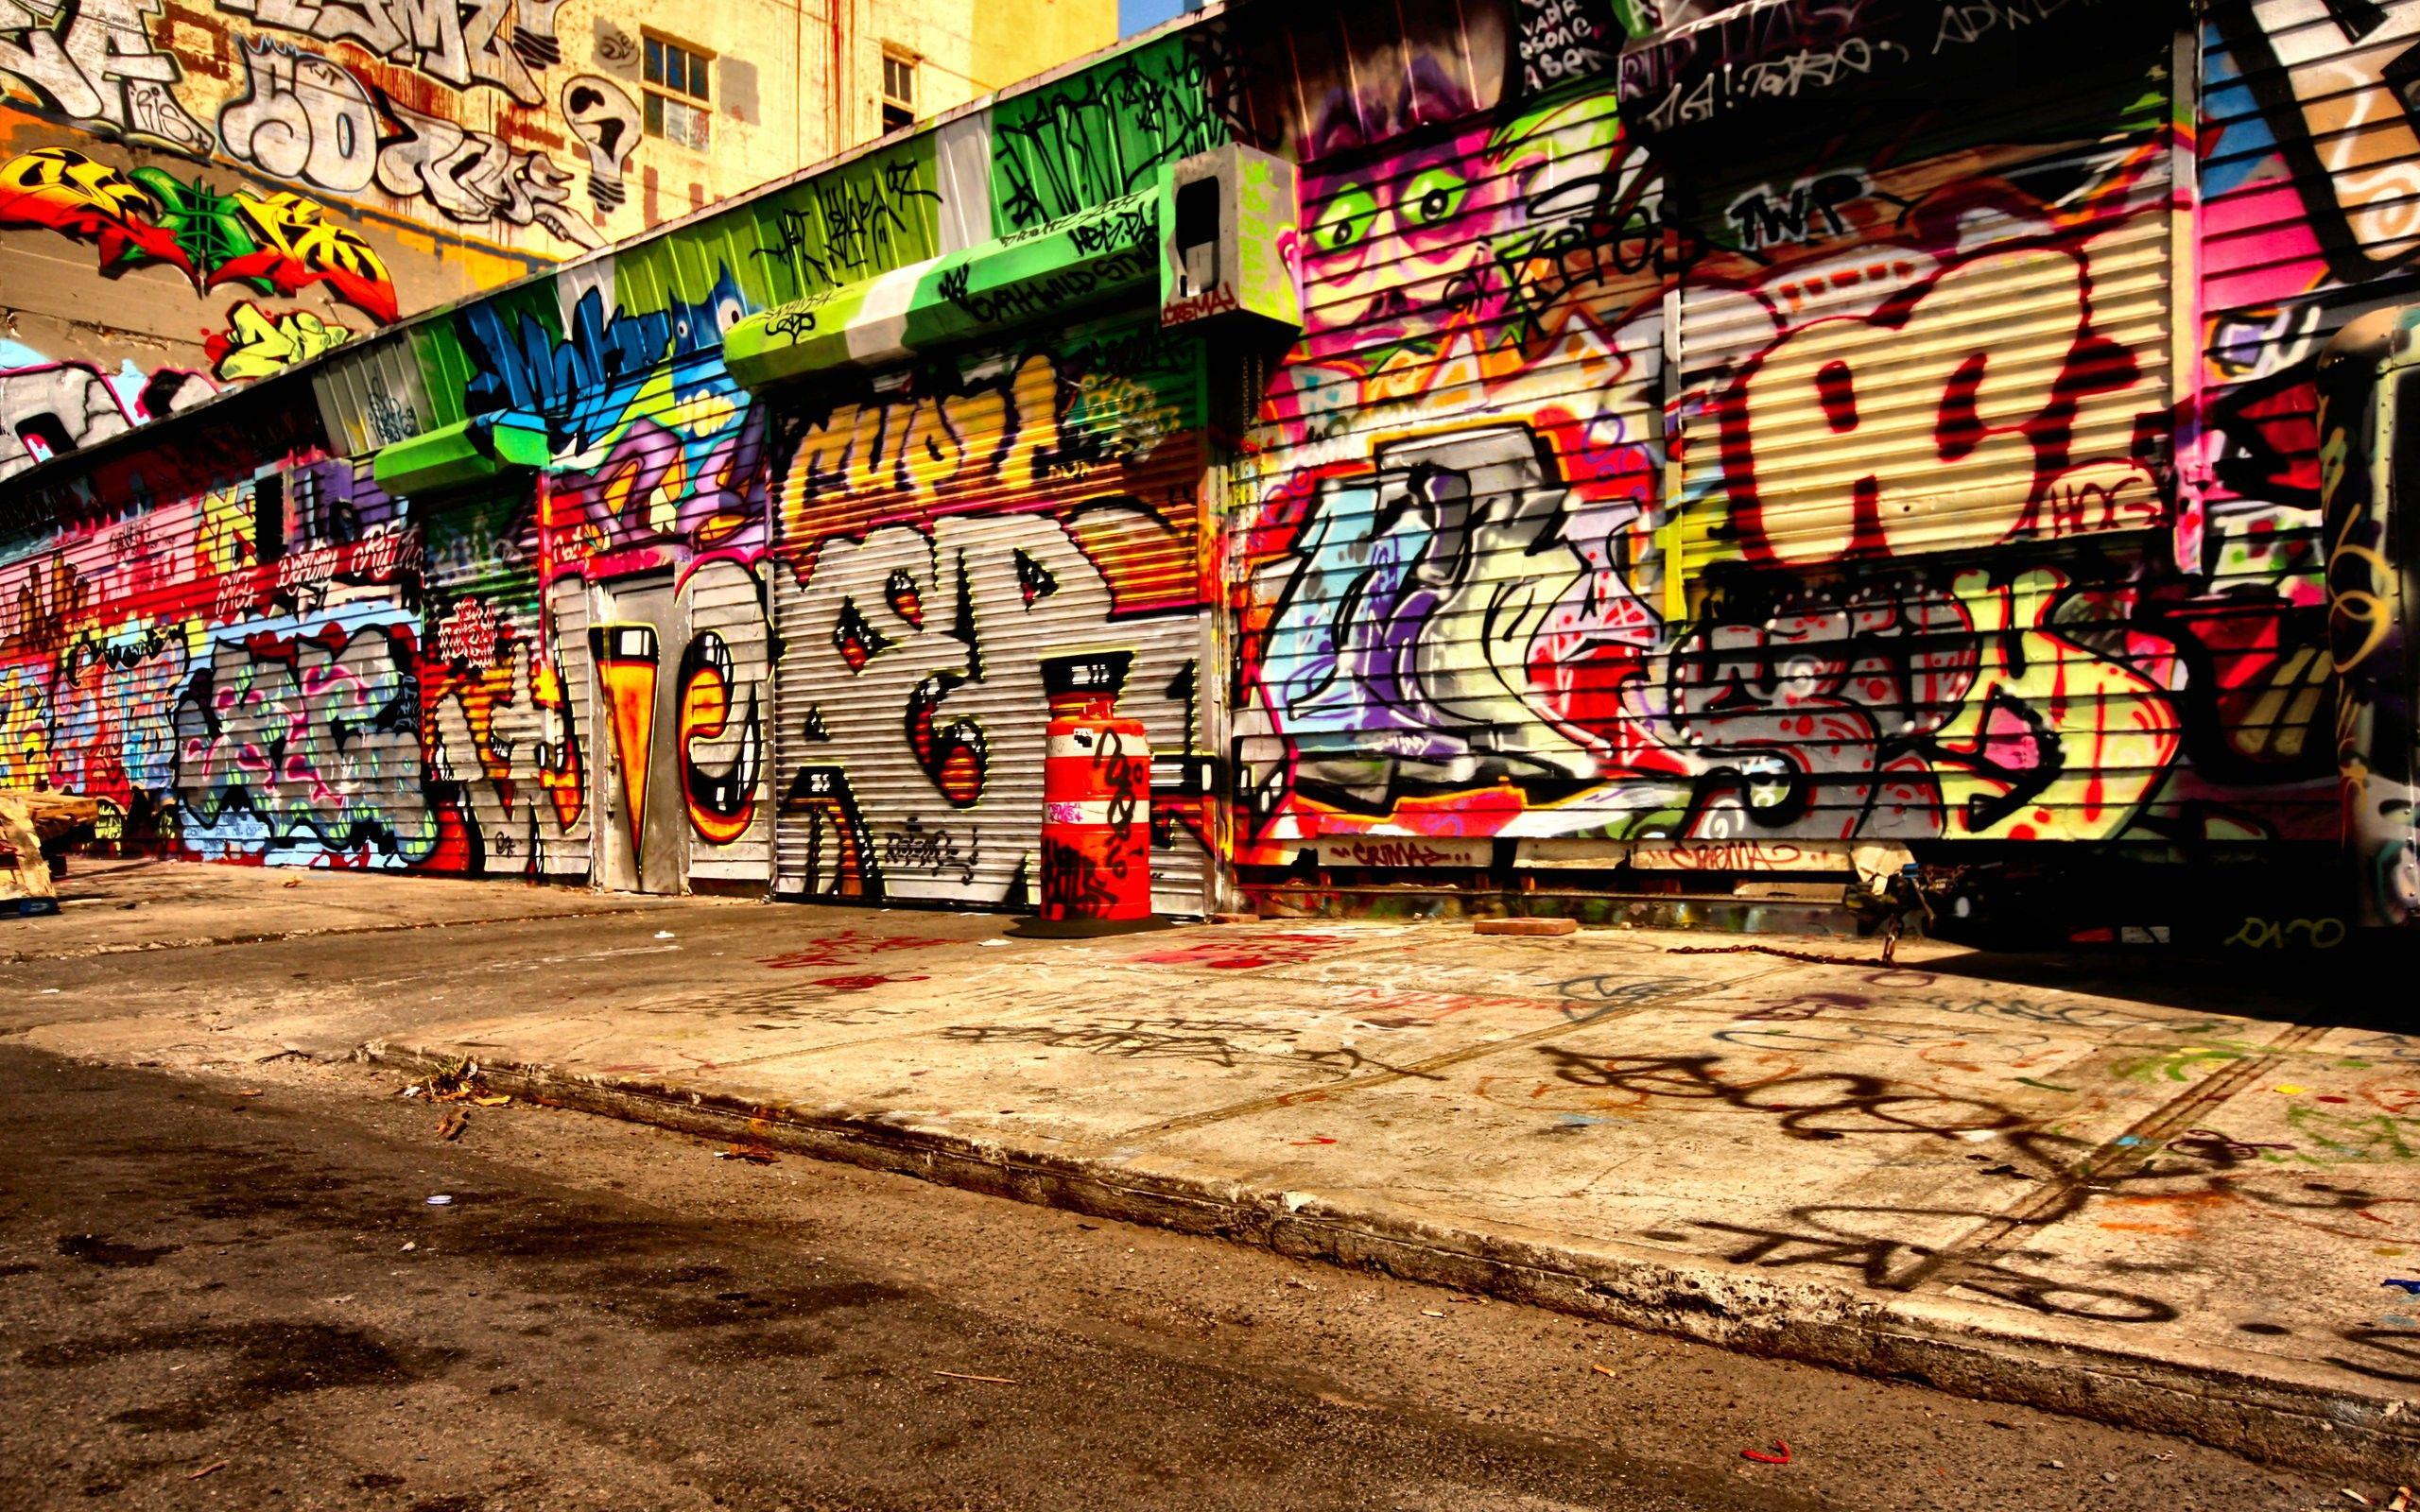 Graffiti art wallpaper - Graffiti Street Art Wallpaper